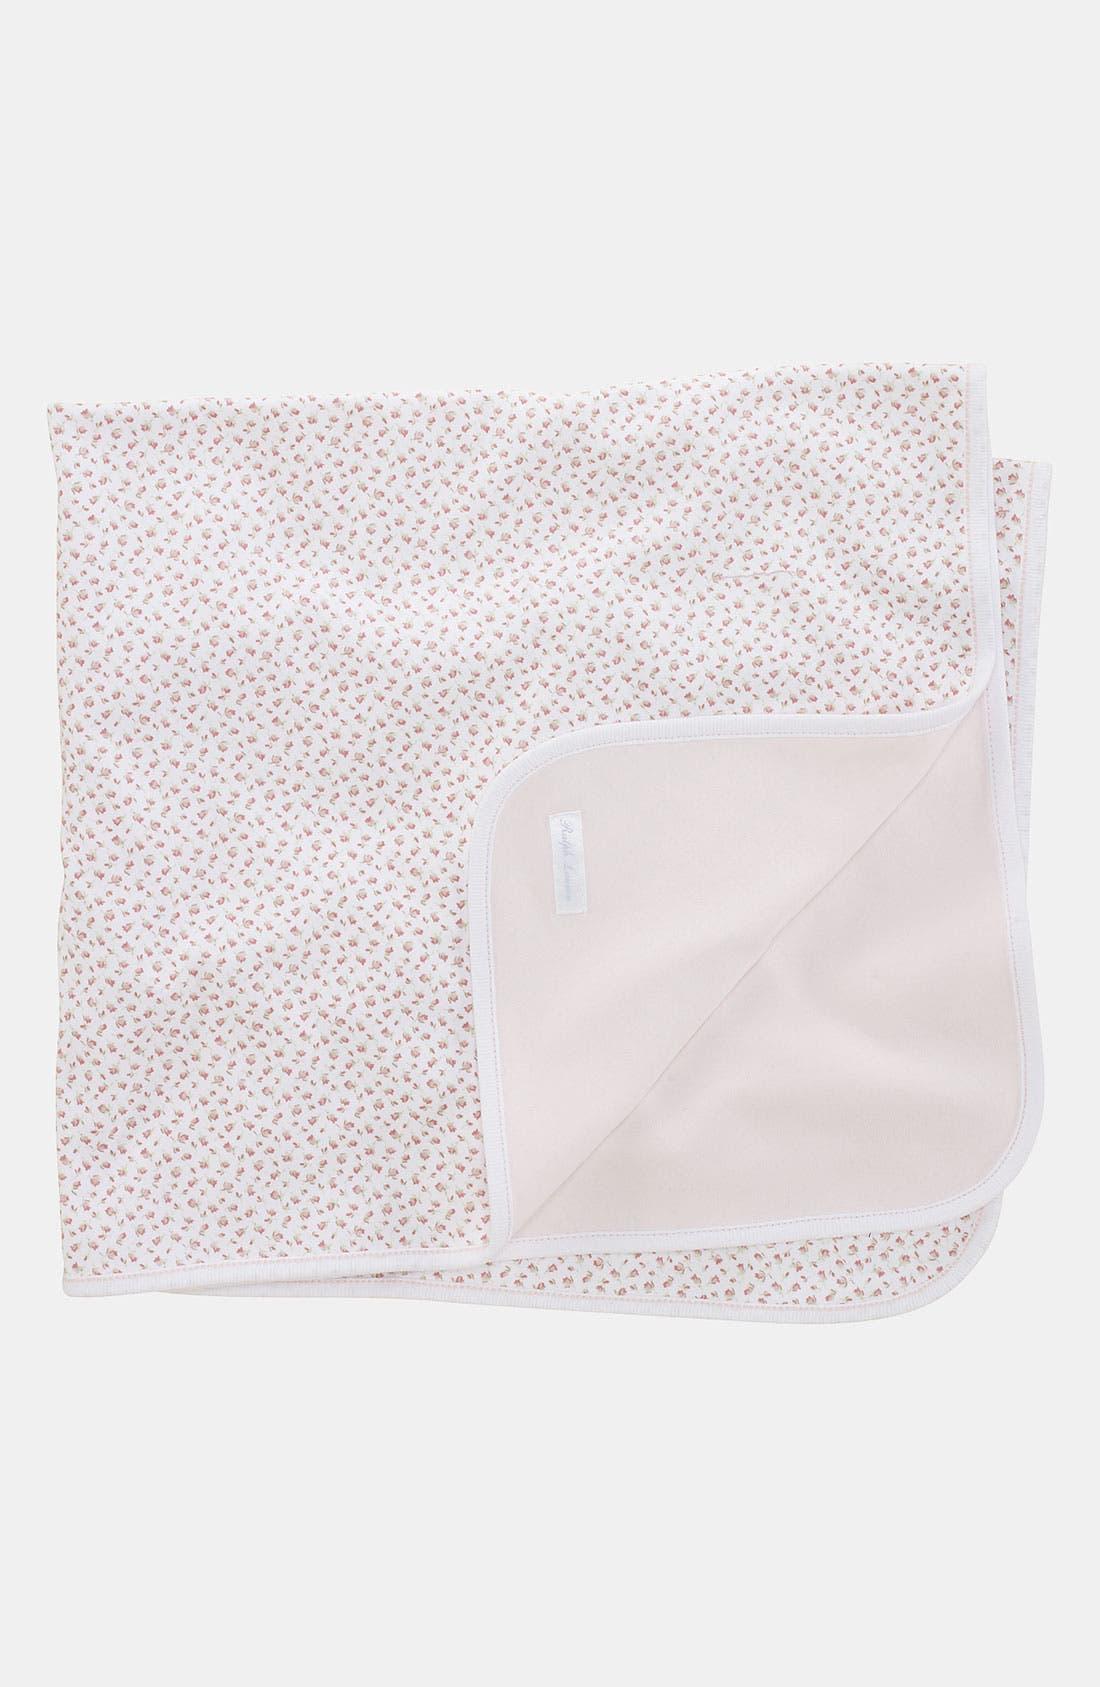 Reversible Receiving Blanket,                             Main thumbnail 1, color,                             100